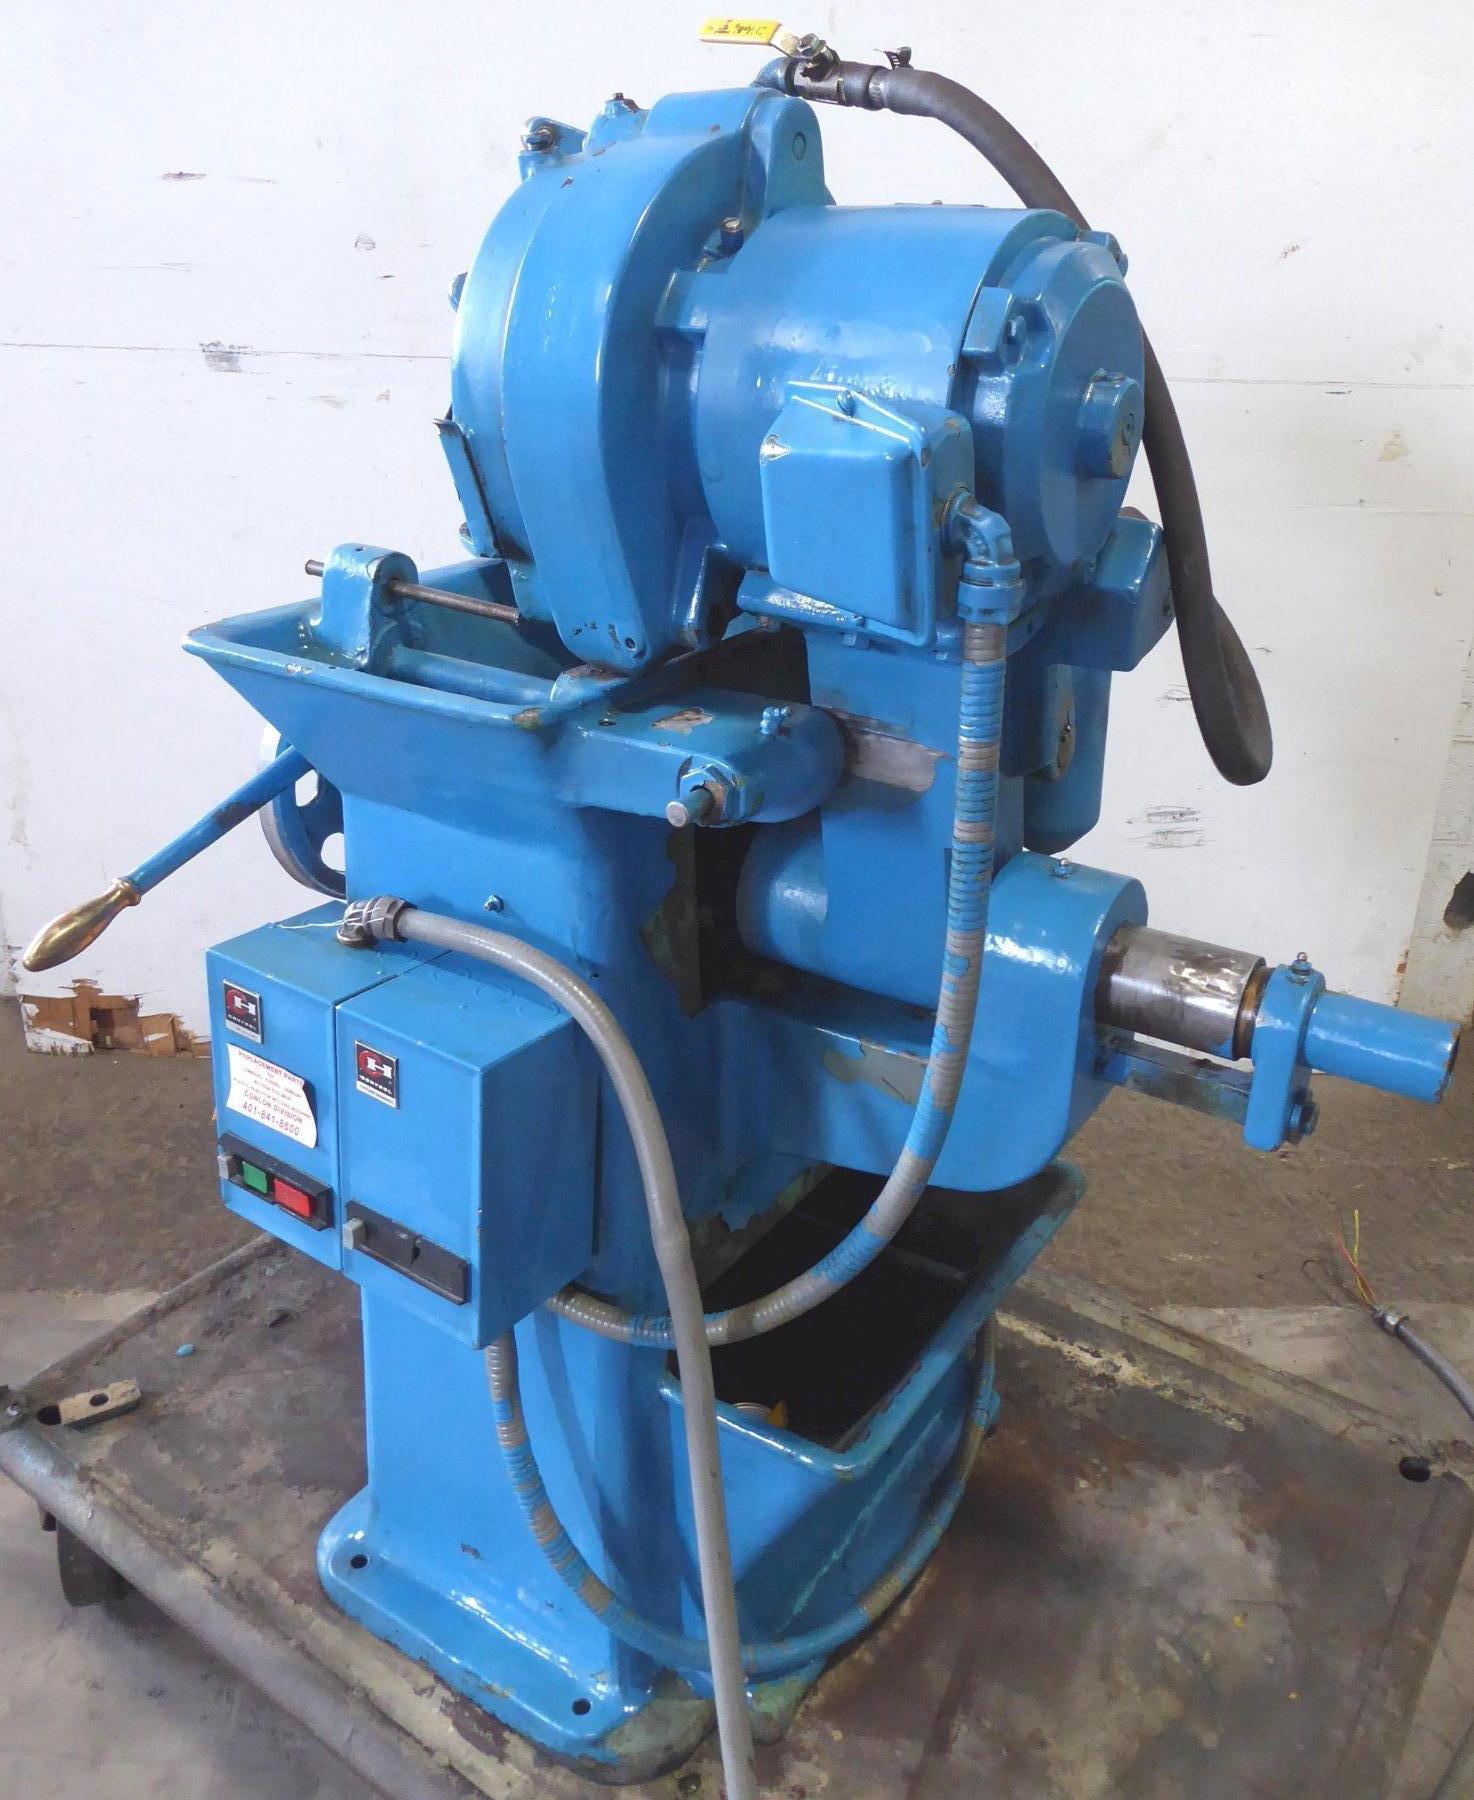 "FARRELL SELLERS Drill Grinder No. 6-GA, 5/16"" - 3"" Capacity, 2 HP, Coolant"